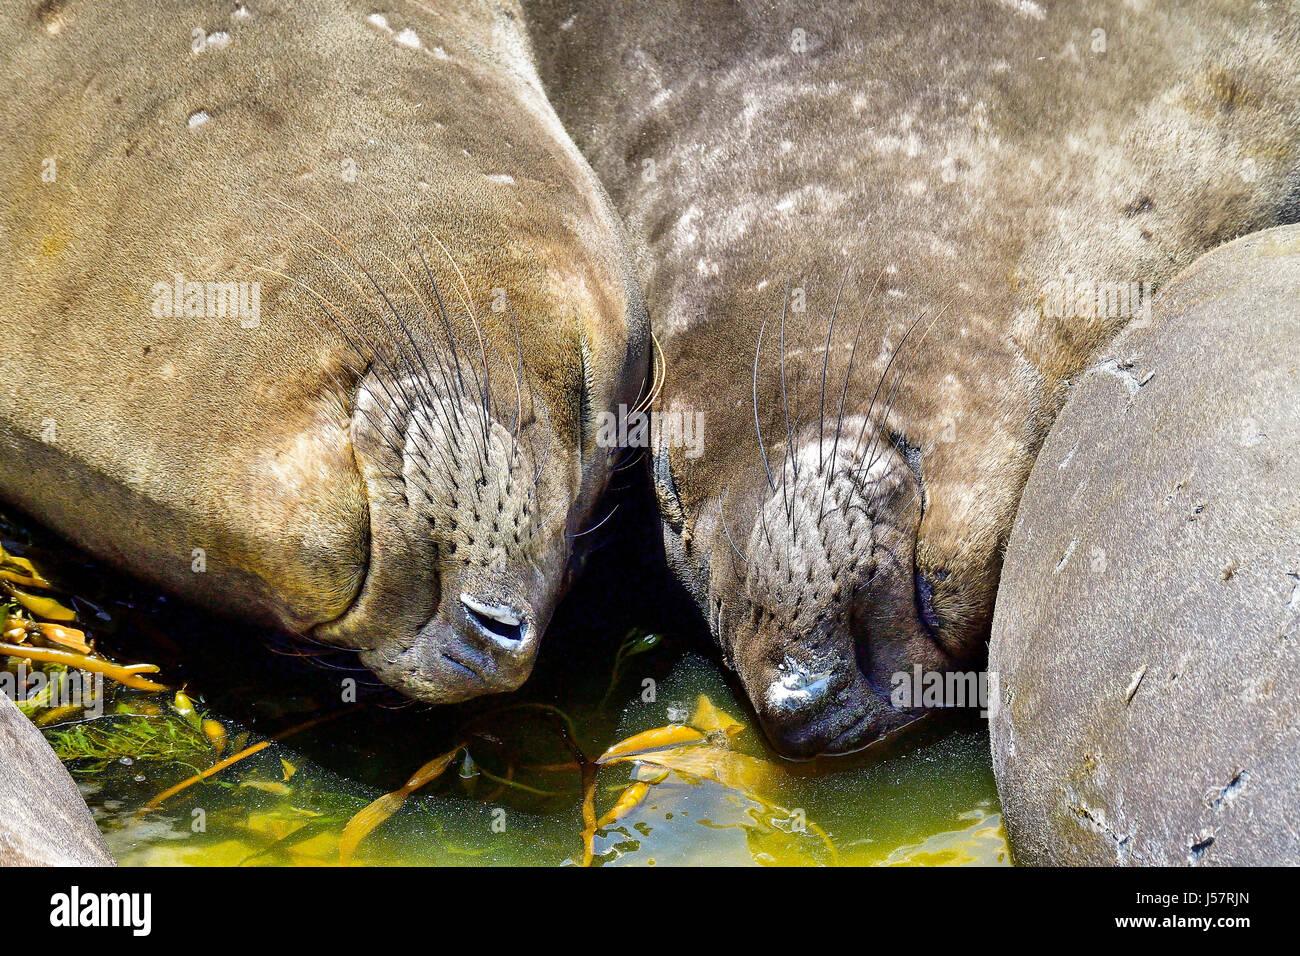 Northern Elephant Seal - Stock Image